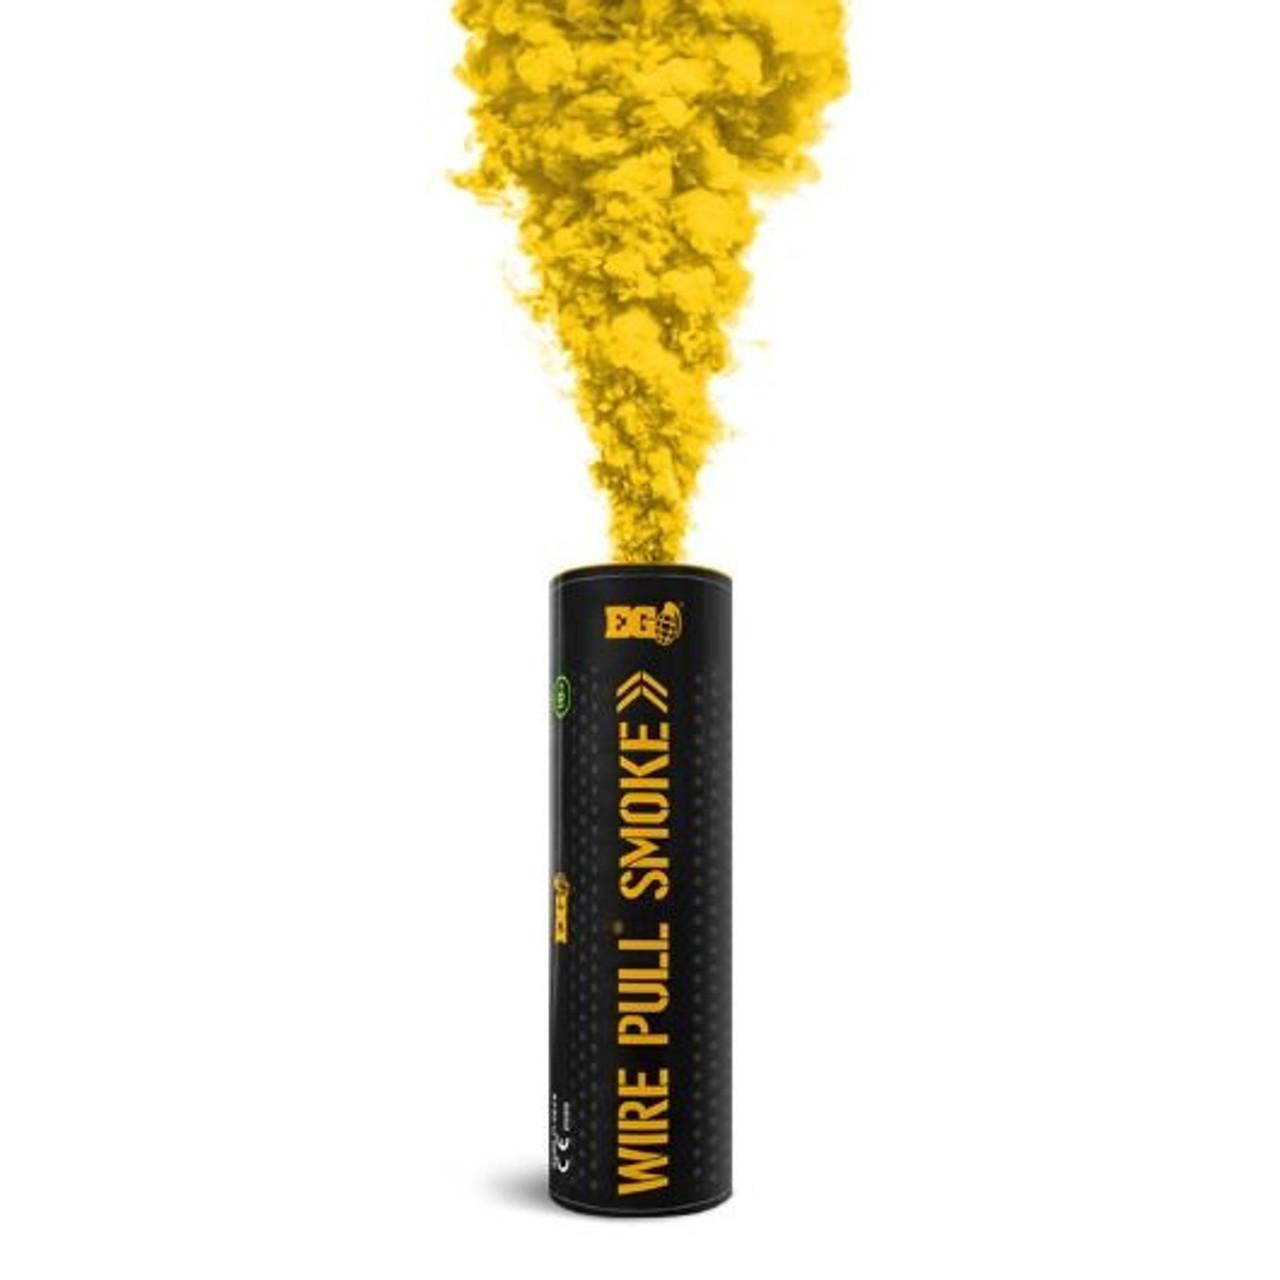 Pyro Shipped Easy Wire Pull Smoke Grenade yellow